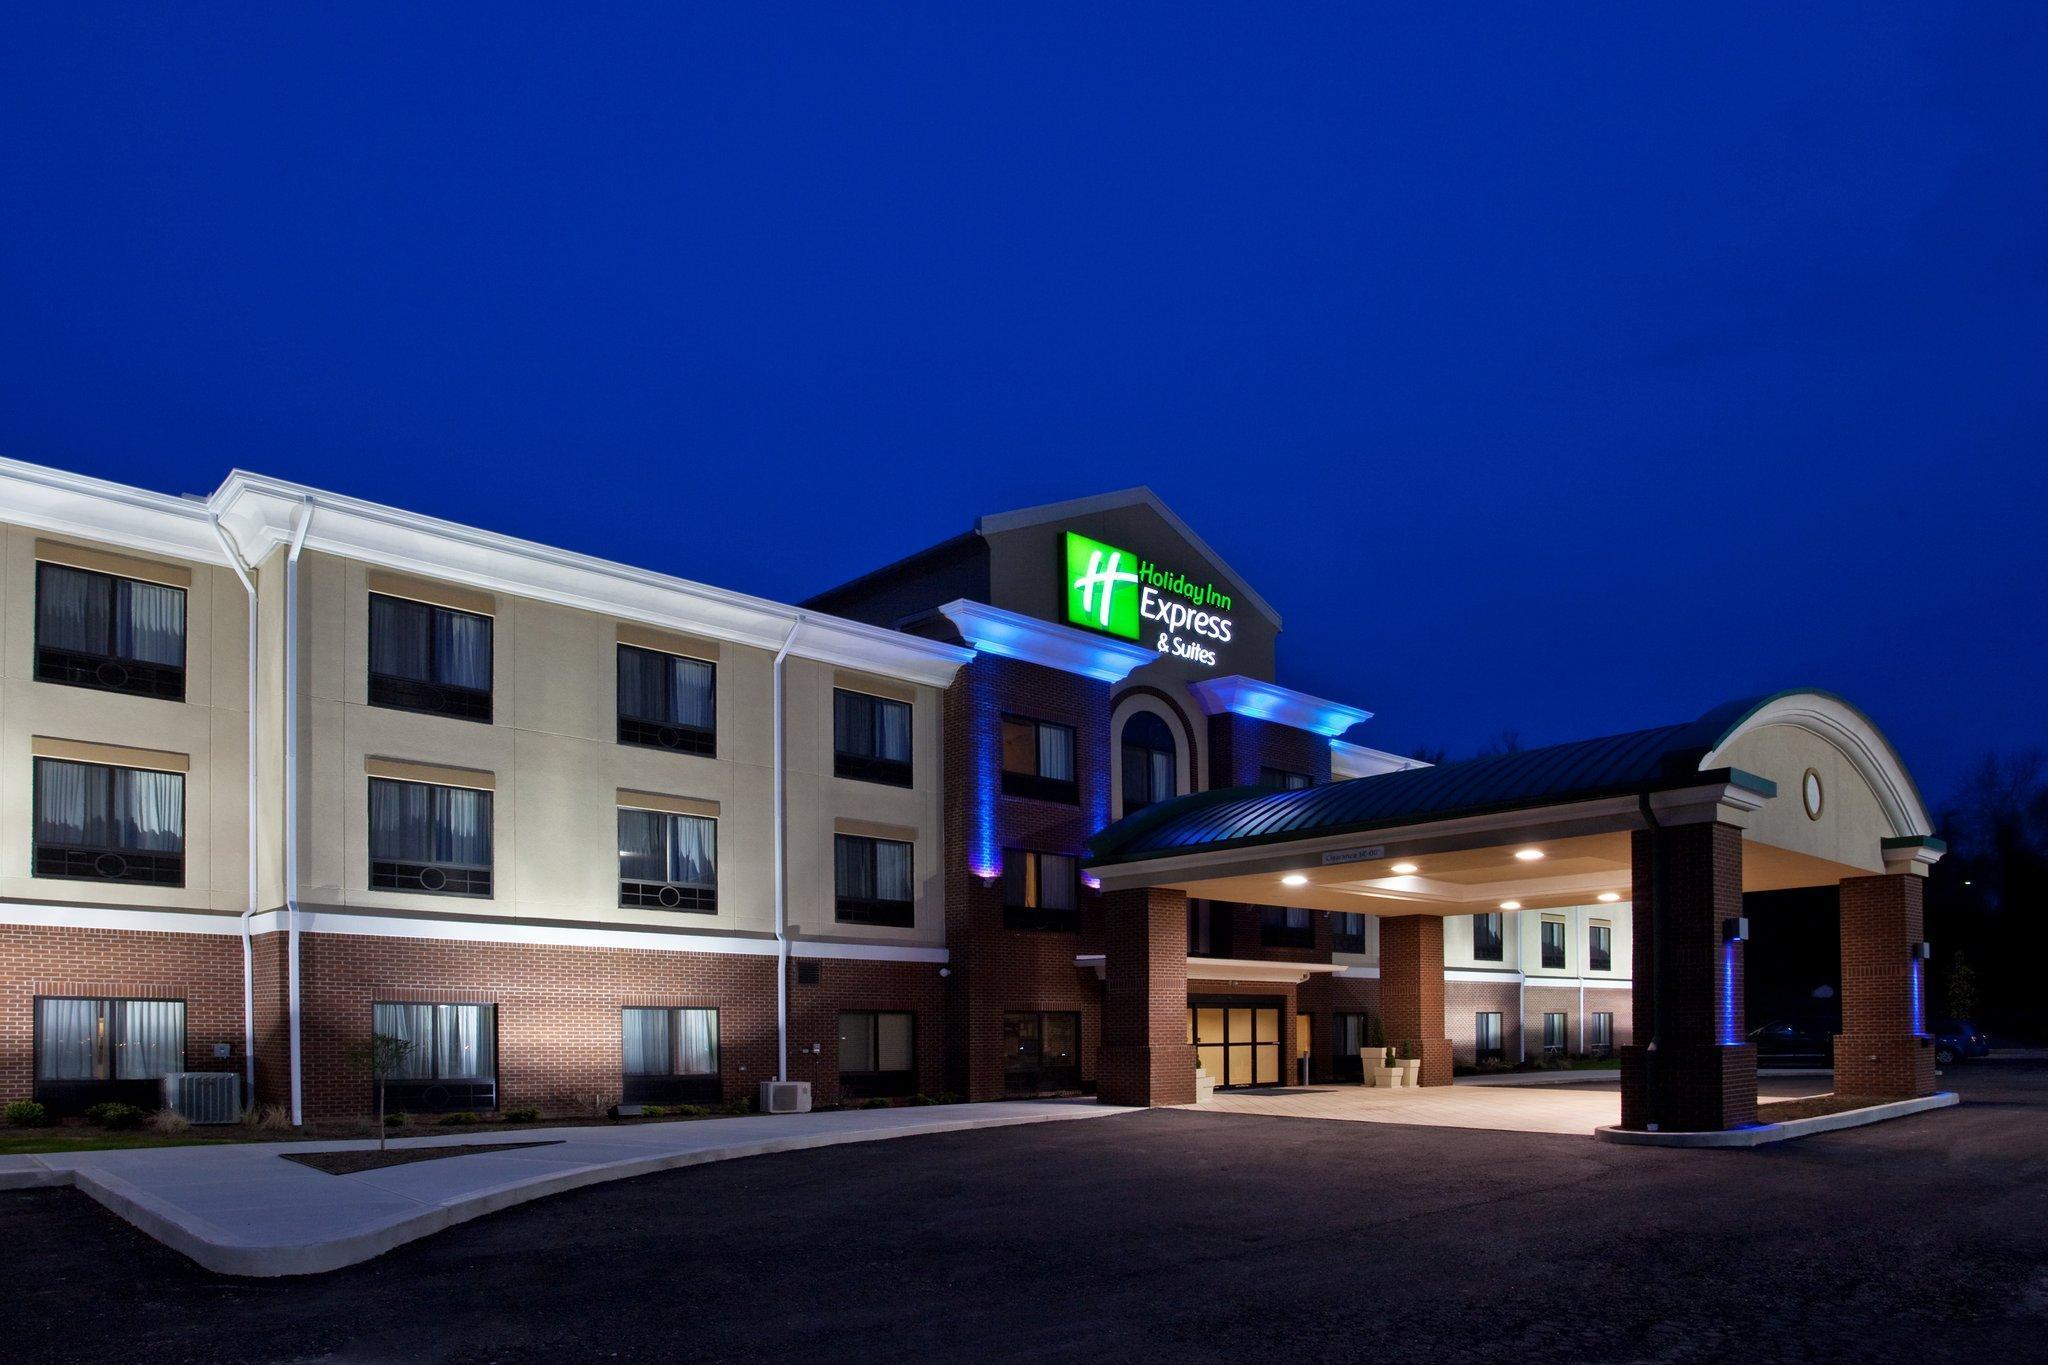 Holiday Inn Express Hotel & Suites Zanesville North Zanesville (OH) United States